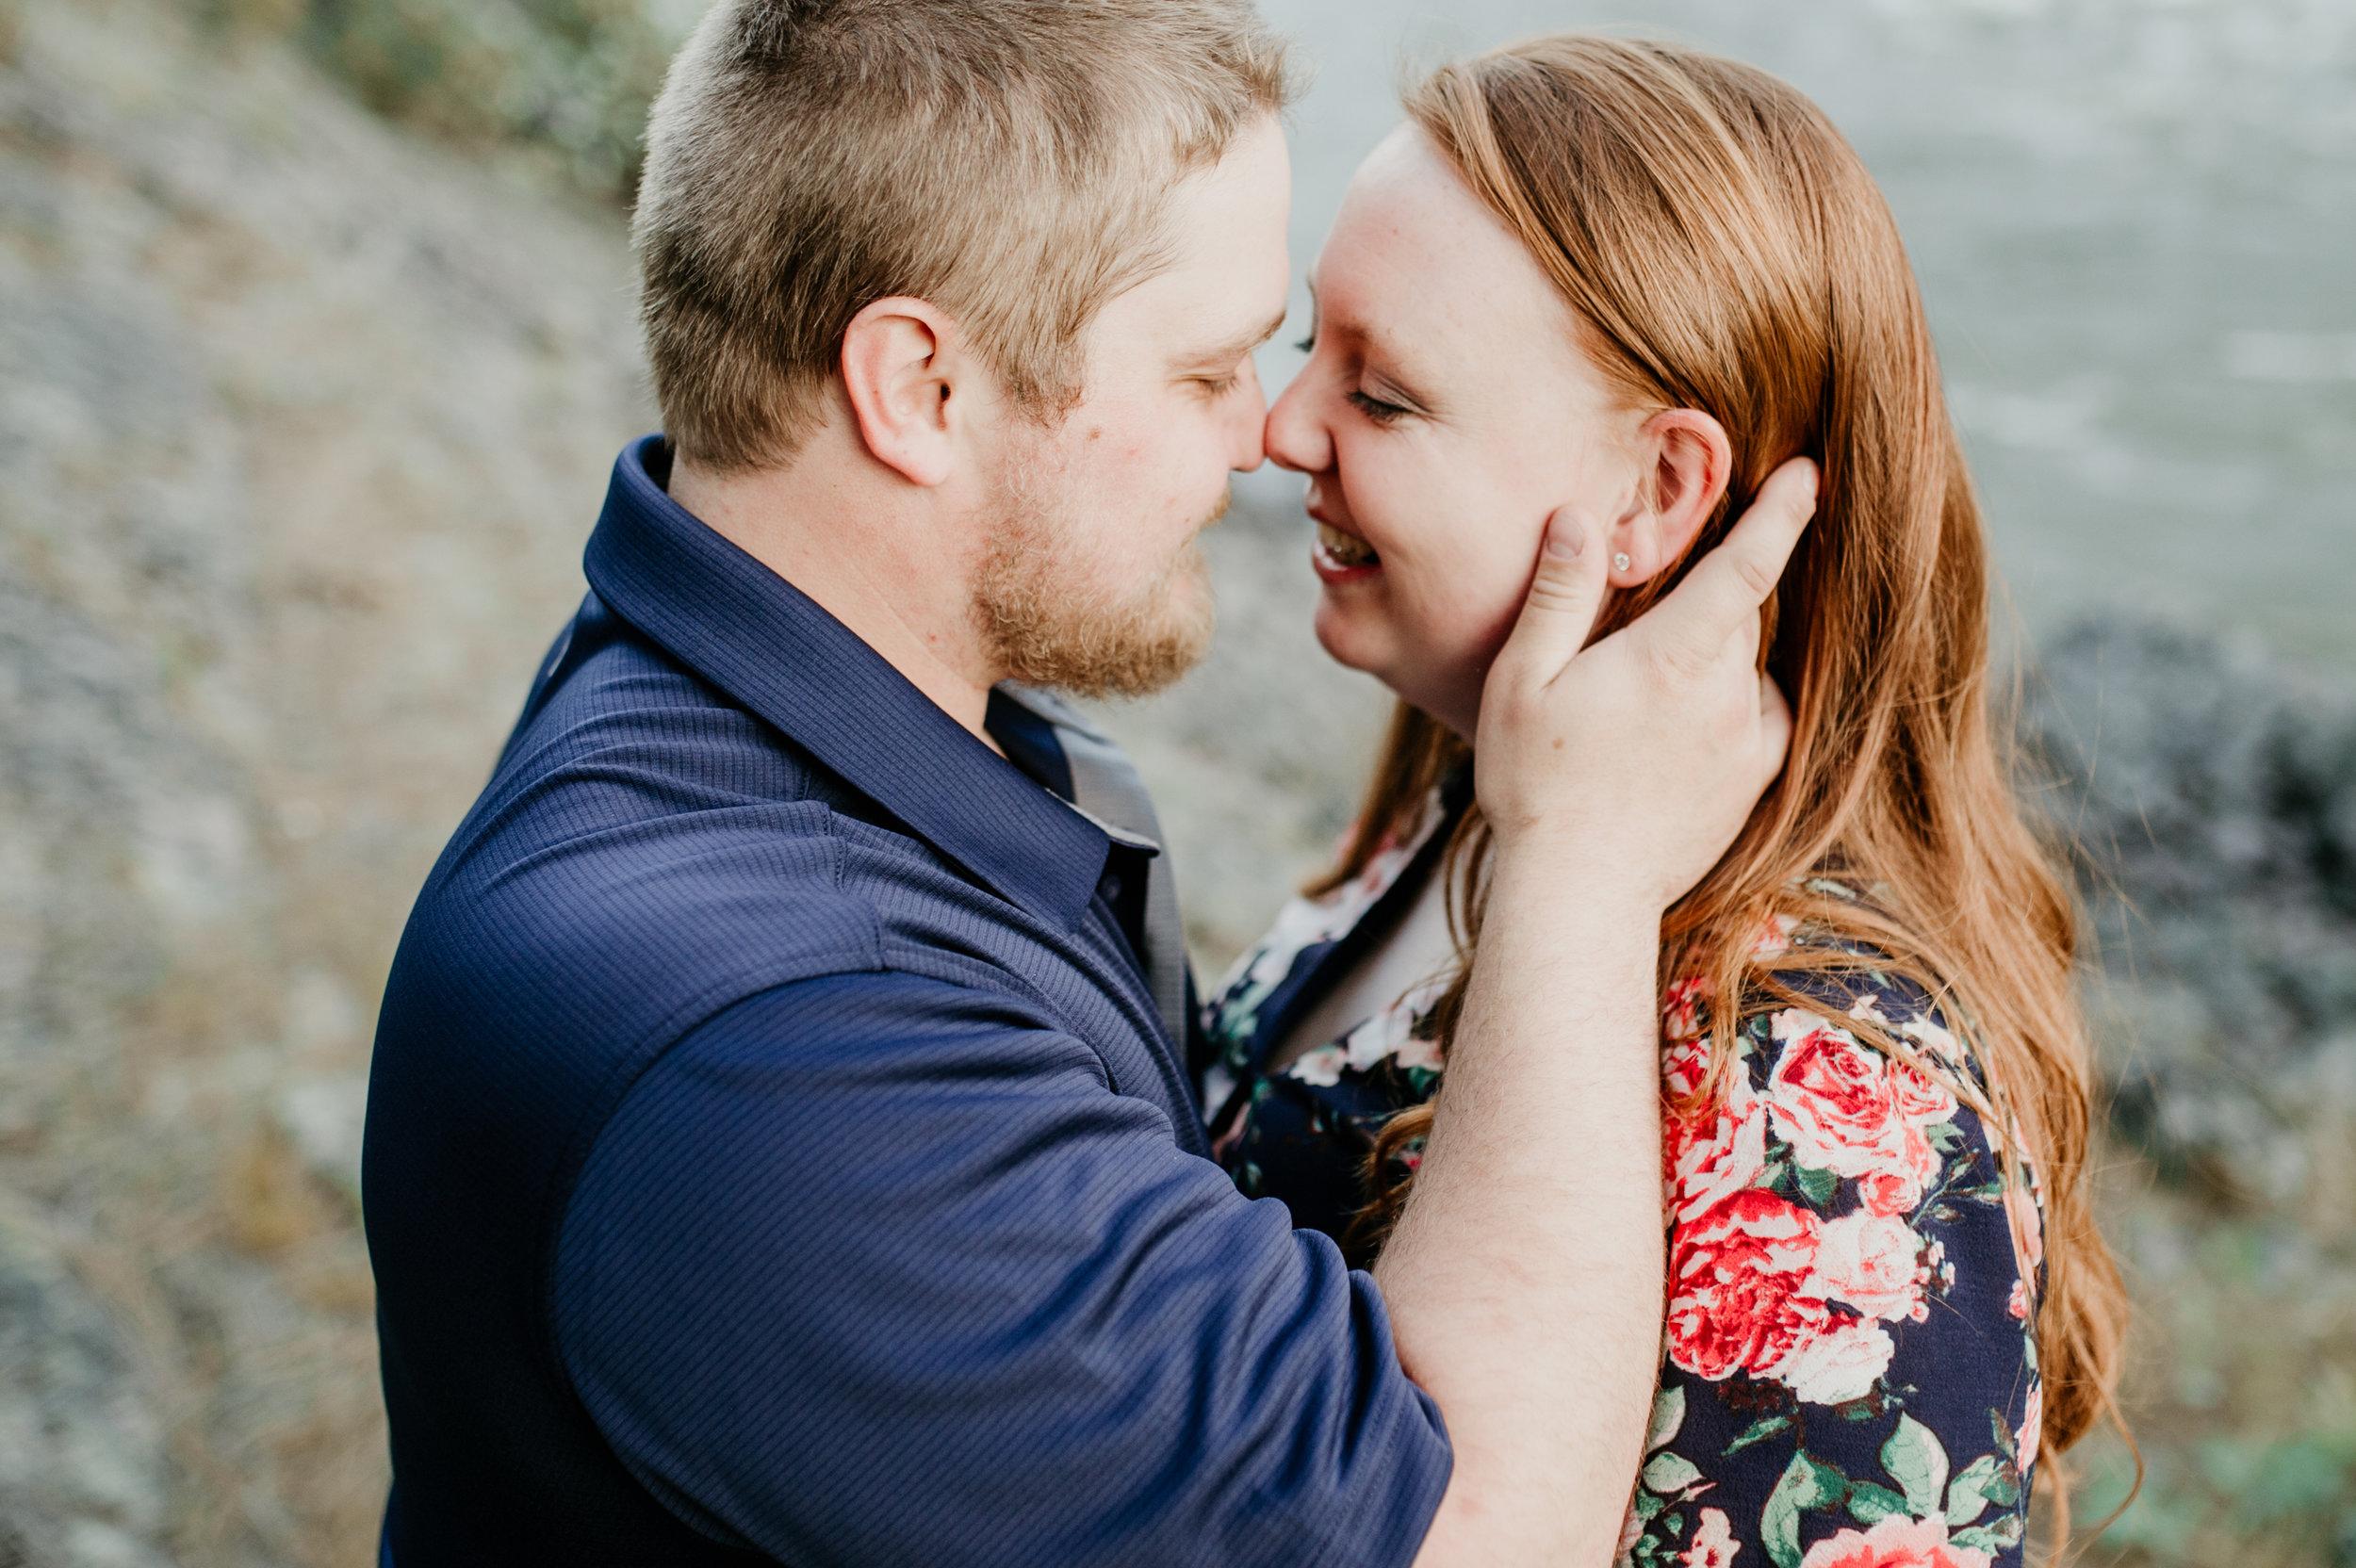 212White Raven Engagement Session_Megan & Justin_Honeybee Weddings_May 10, 2019-599.jpg